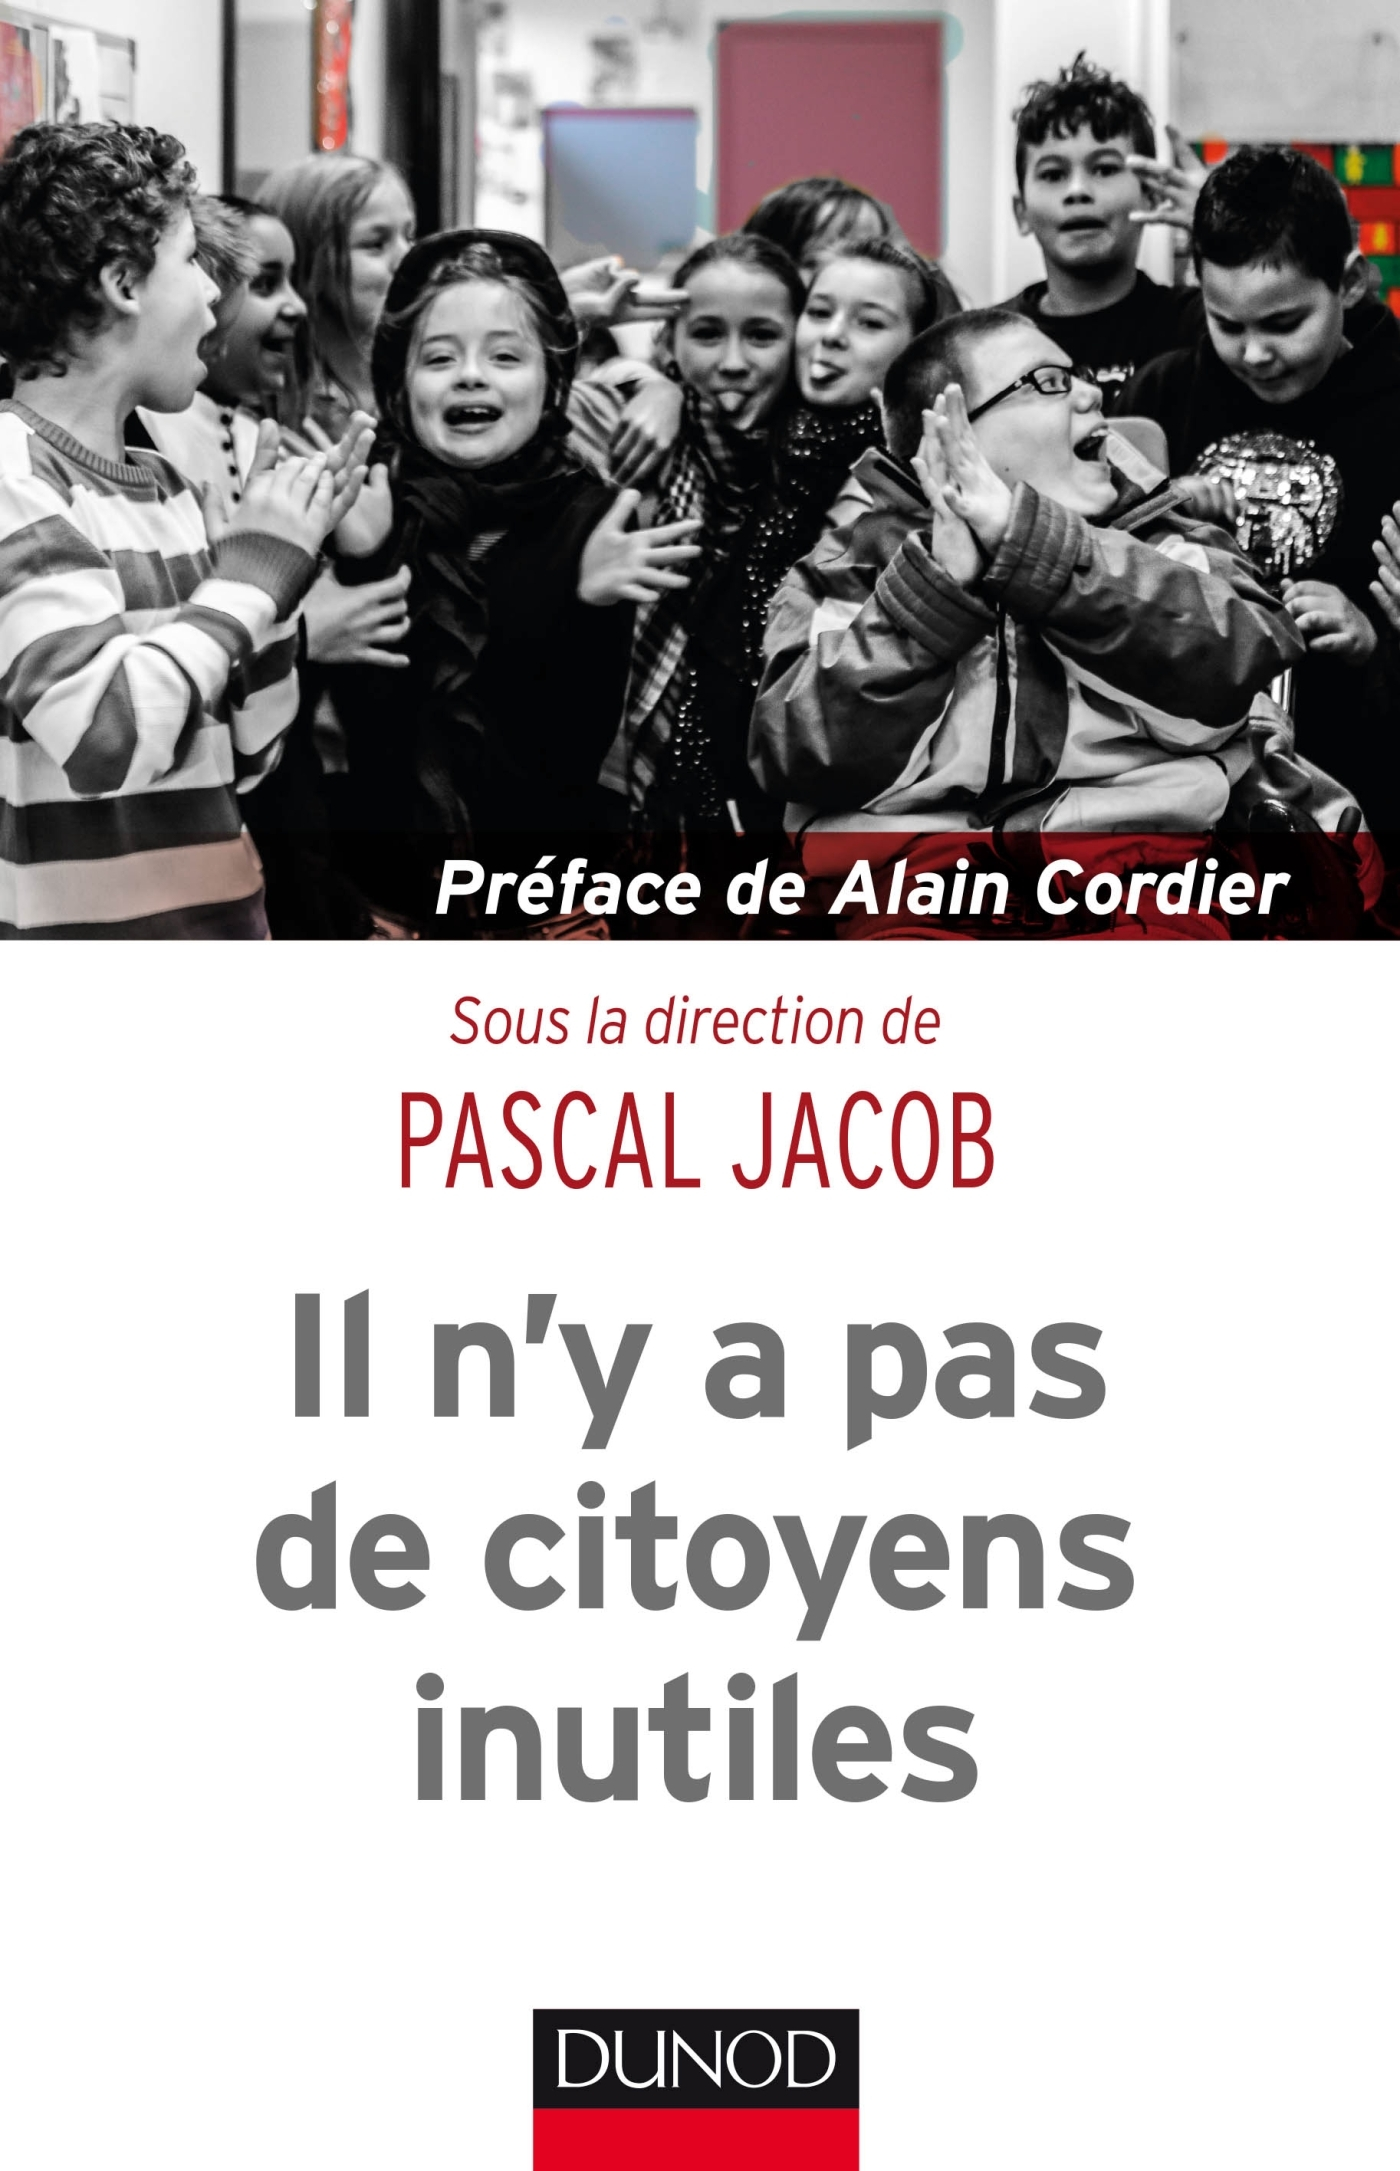 IL N'Y A PAS DE CITOYENS INUTILES